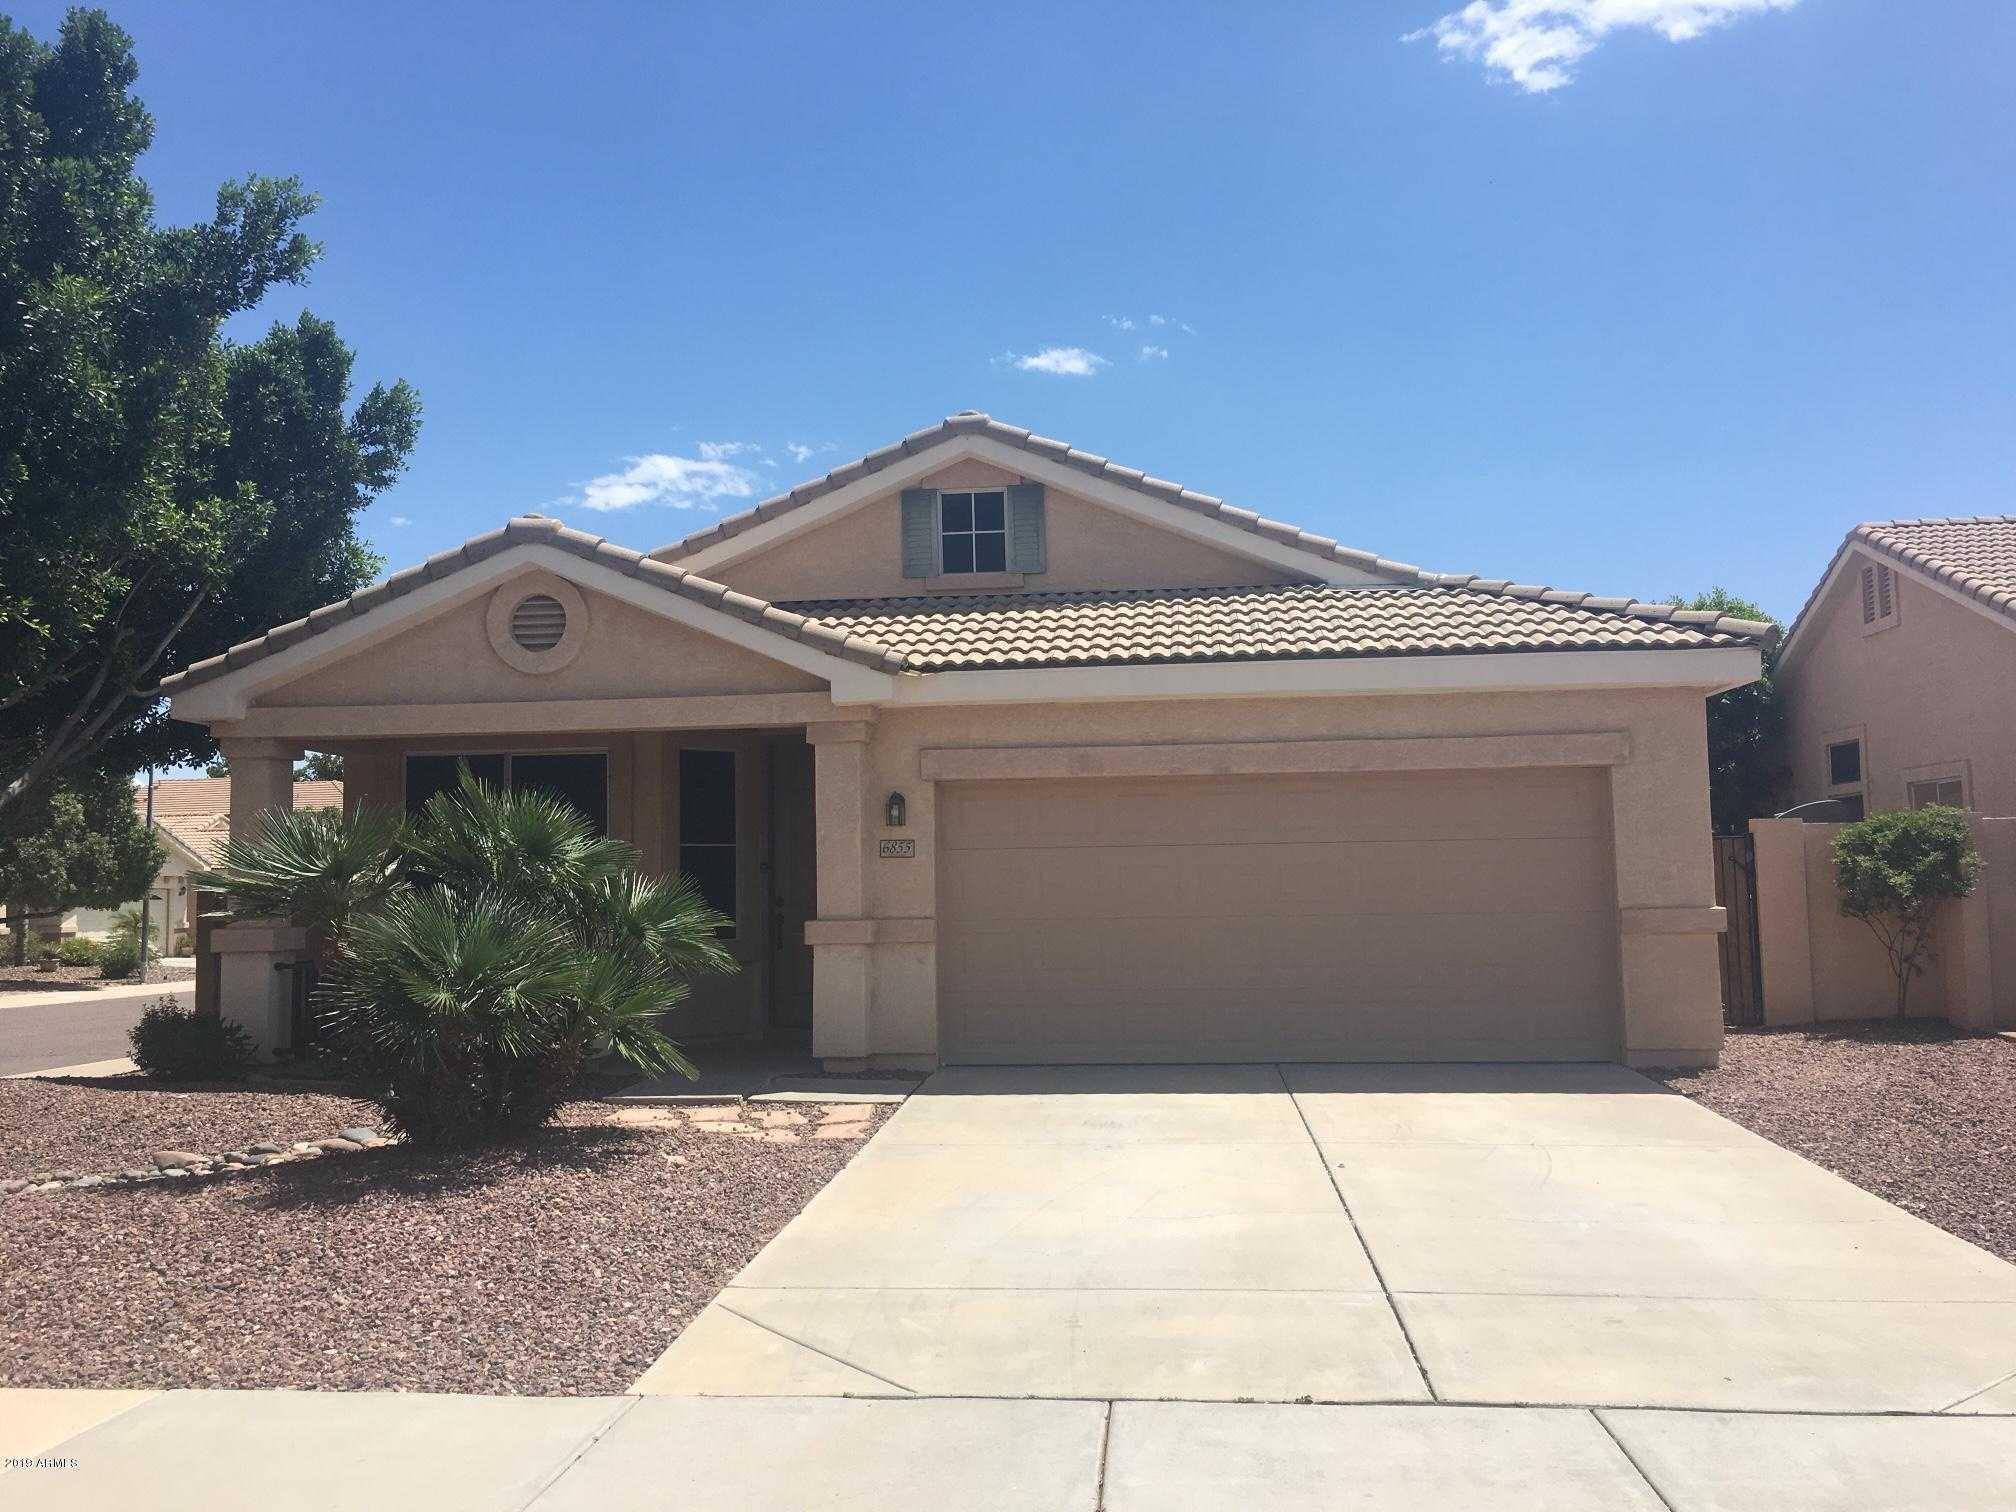 $349,900 - 4Br/2Ba - Home for Sale in Fulton Homes At Sierra Verde, Glendale